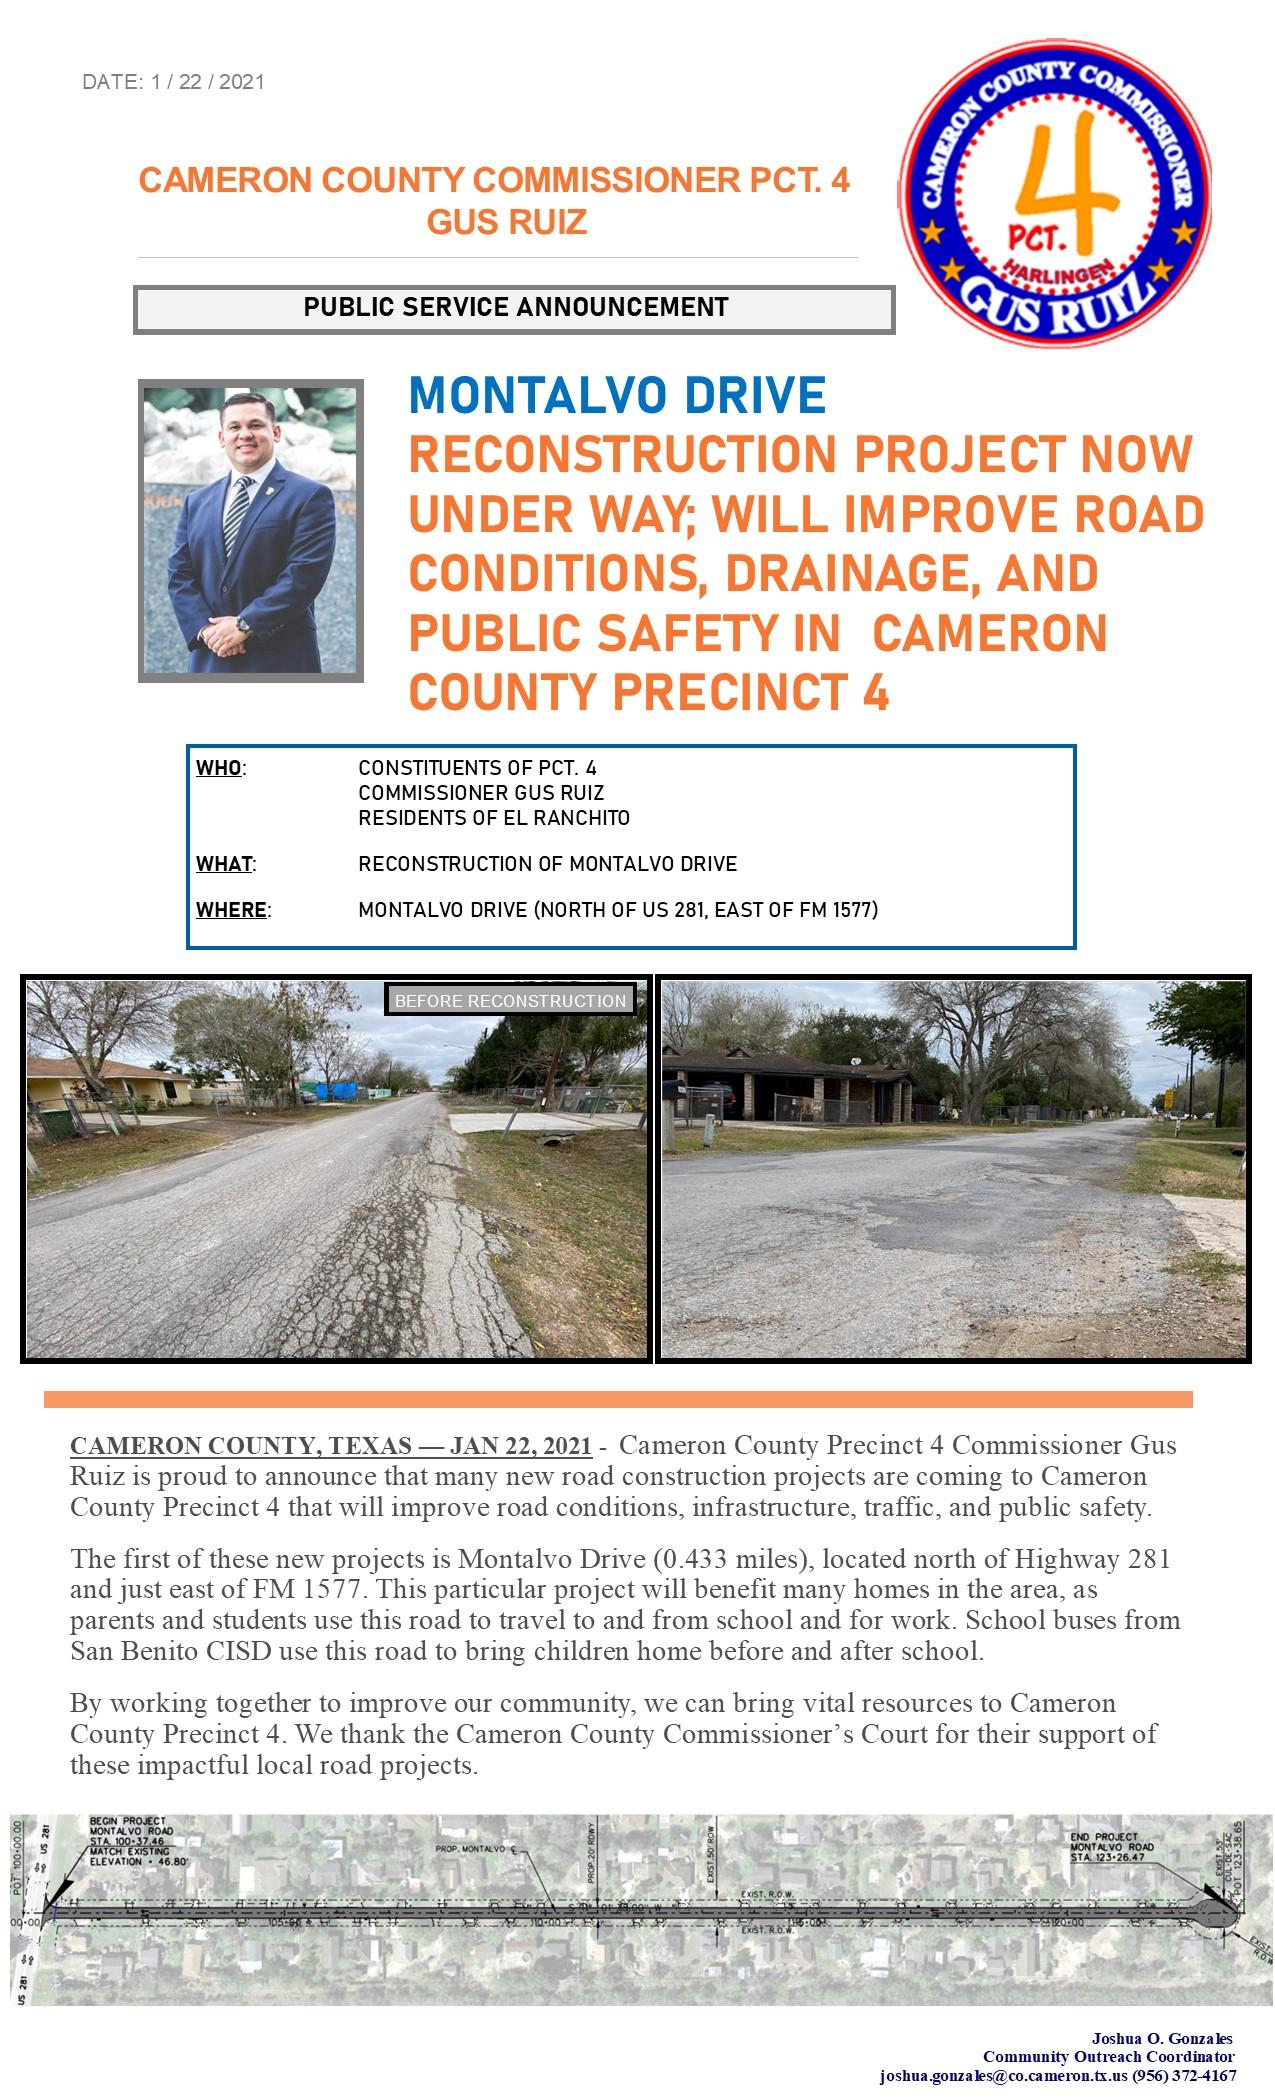 Montalvo Drive Reconstruction Project